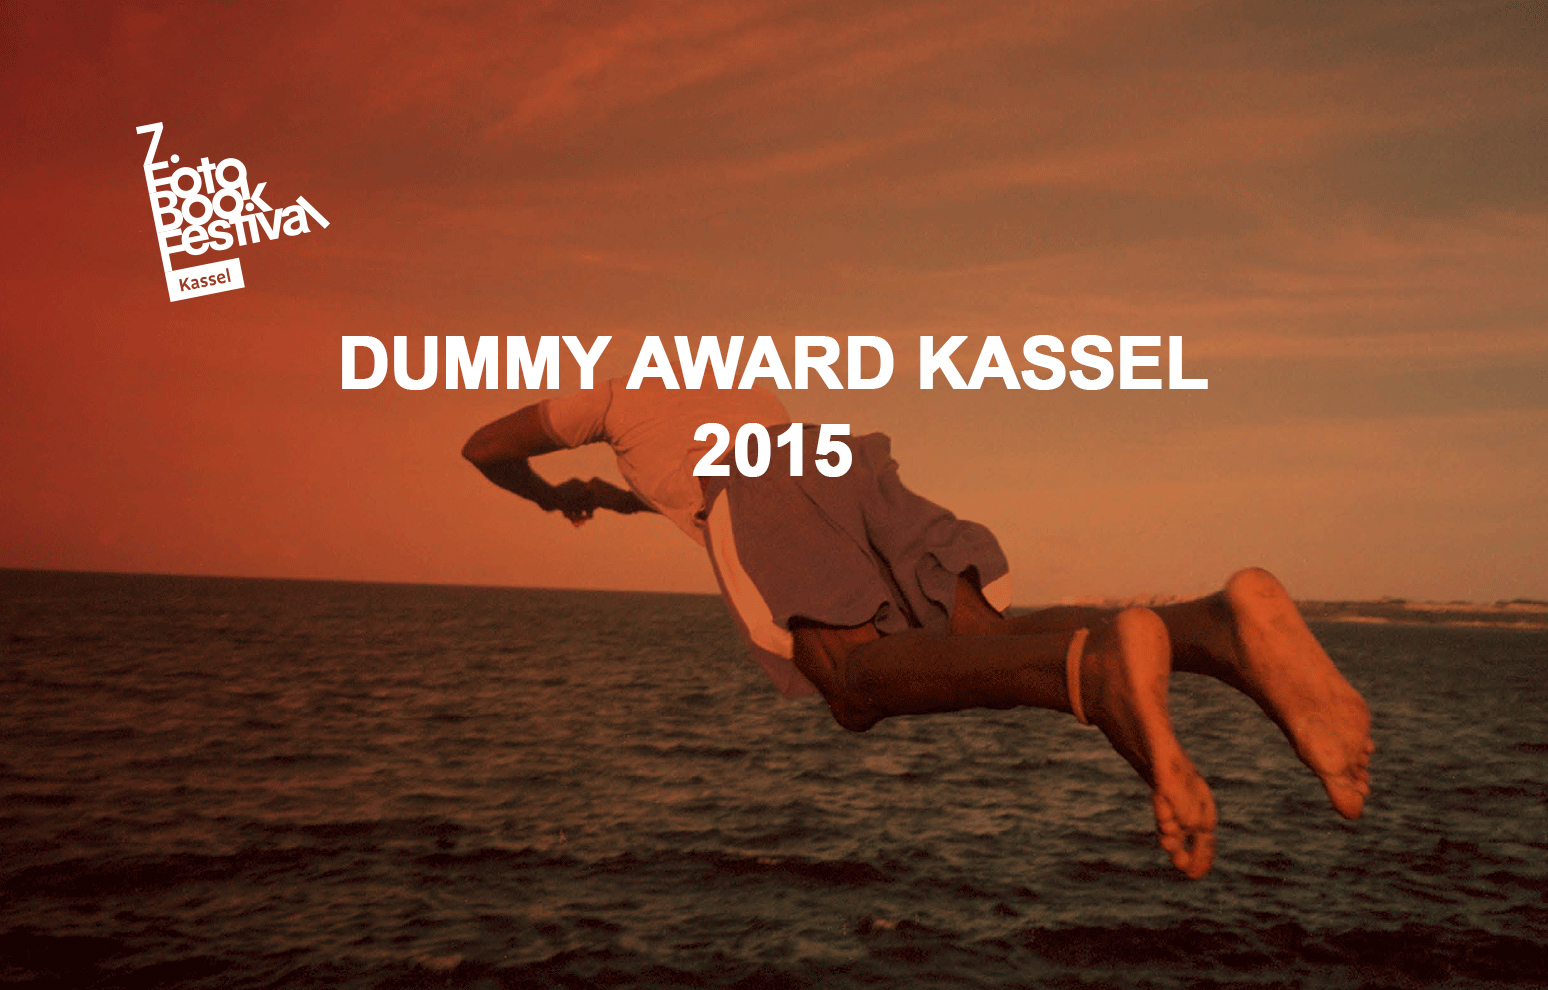 The Fotobookfestival Kassel Dummy Award 2015 at PhotoIreland Festival.